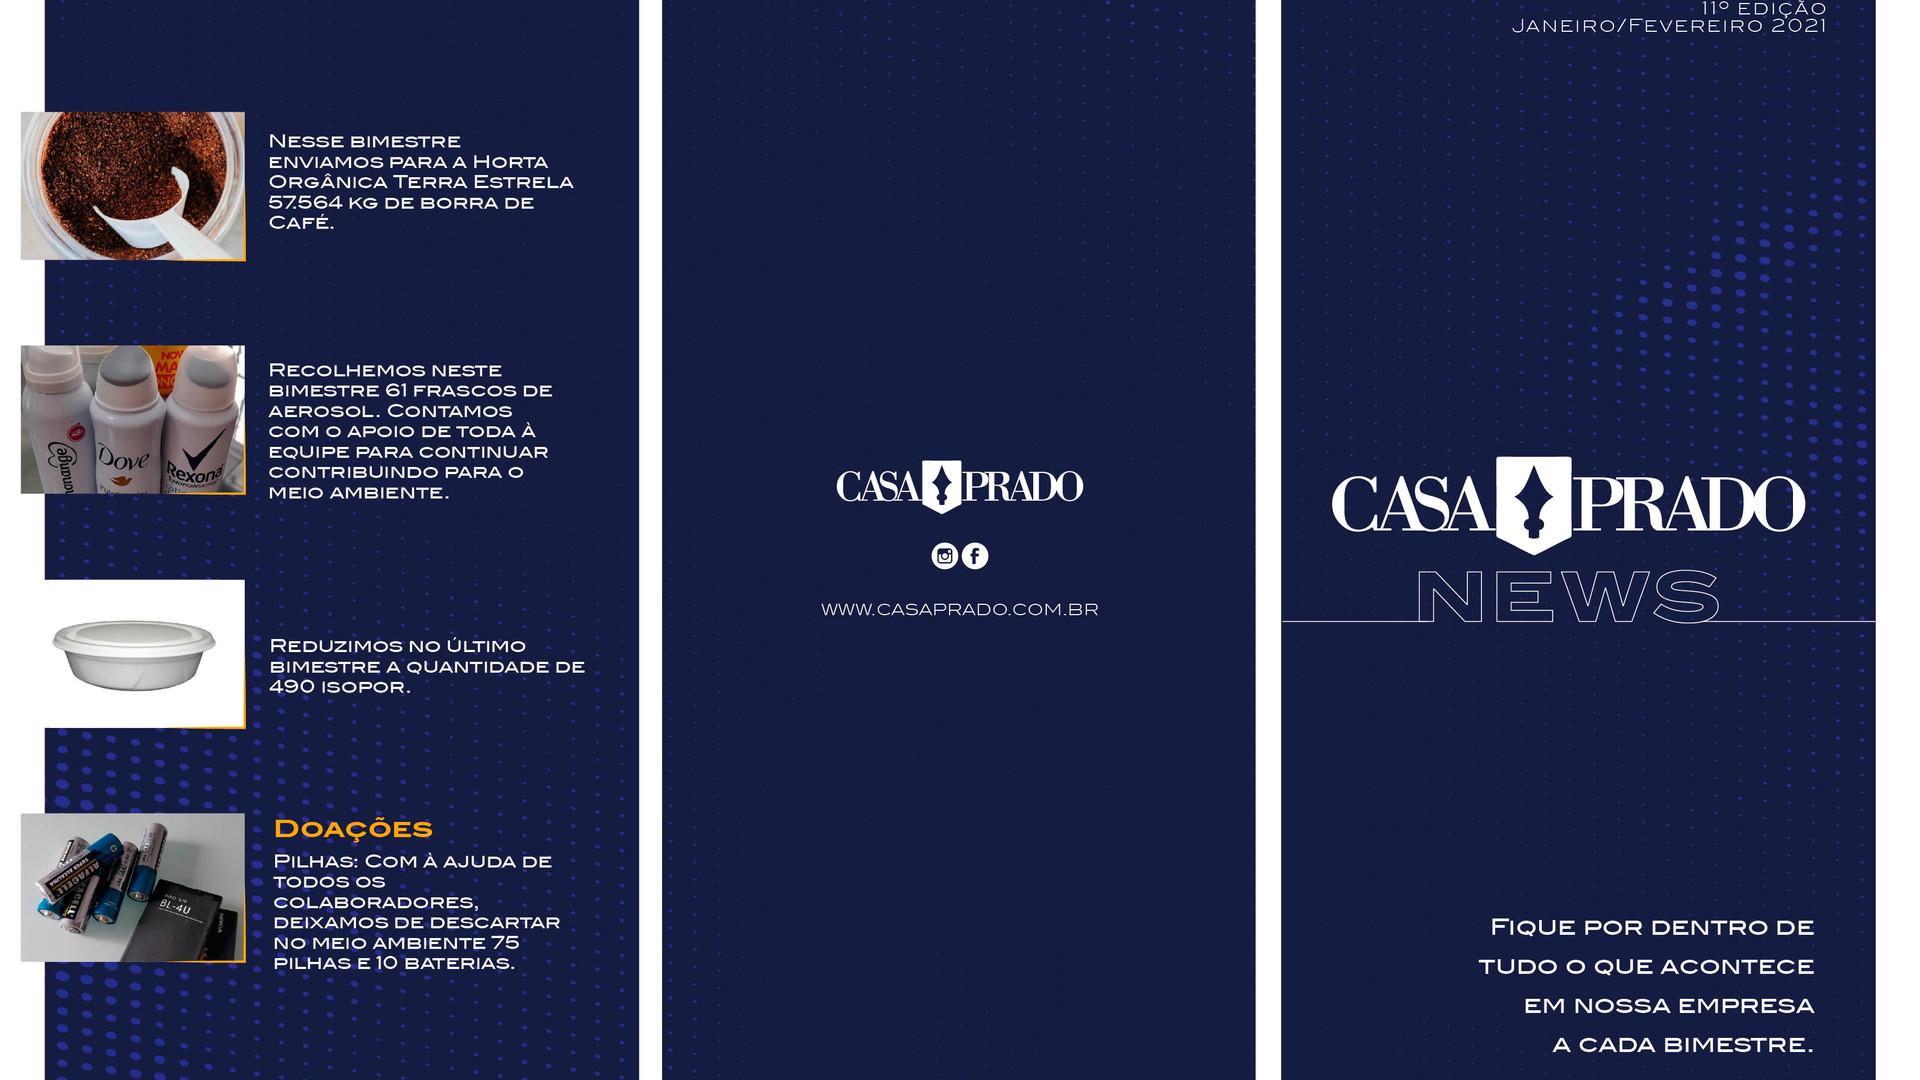 JUL_CASA_PRADO_NEWS_INTERNA_impresso_180